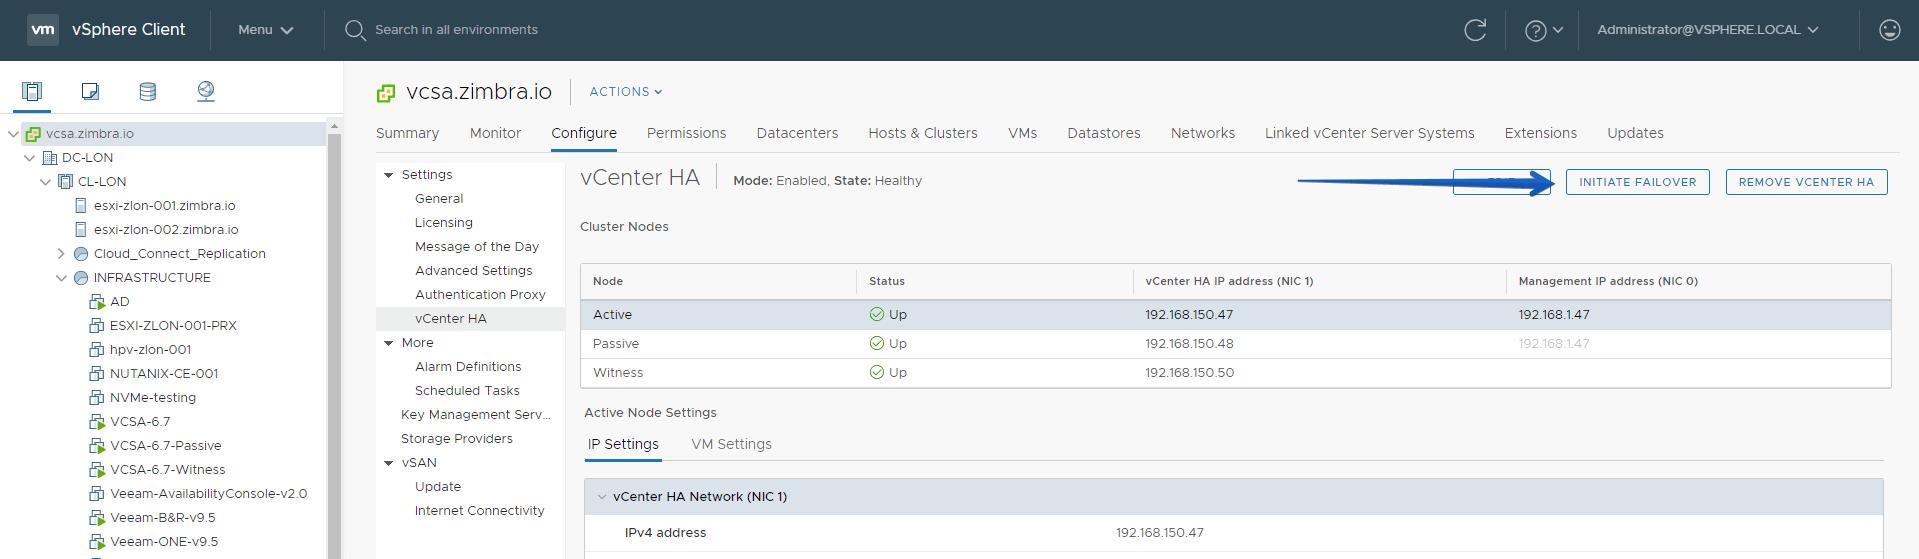 VMware: How to configure VCSA 6 7 HA in vSphere Client HTML5